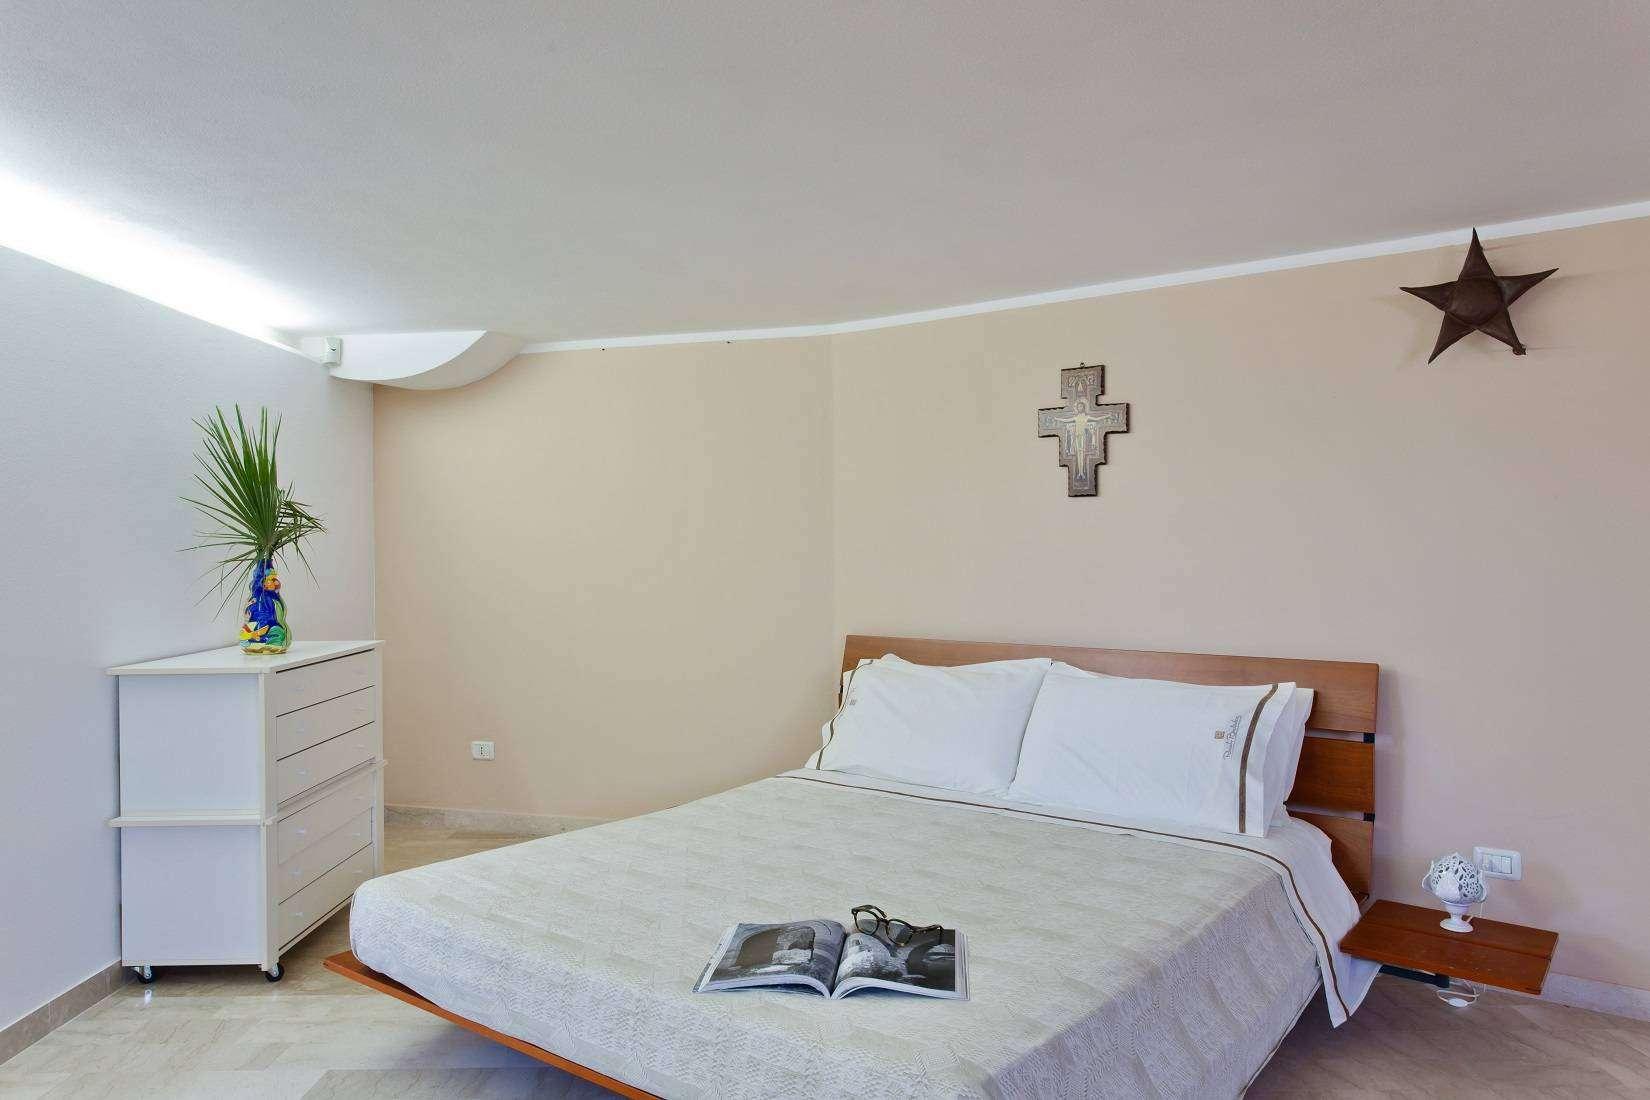 14 Infinity Double Bedroom